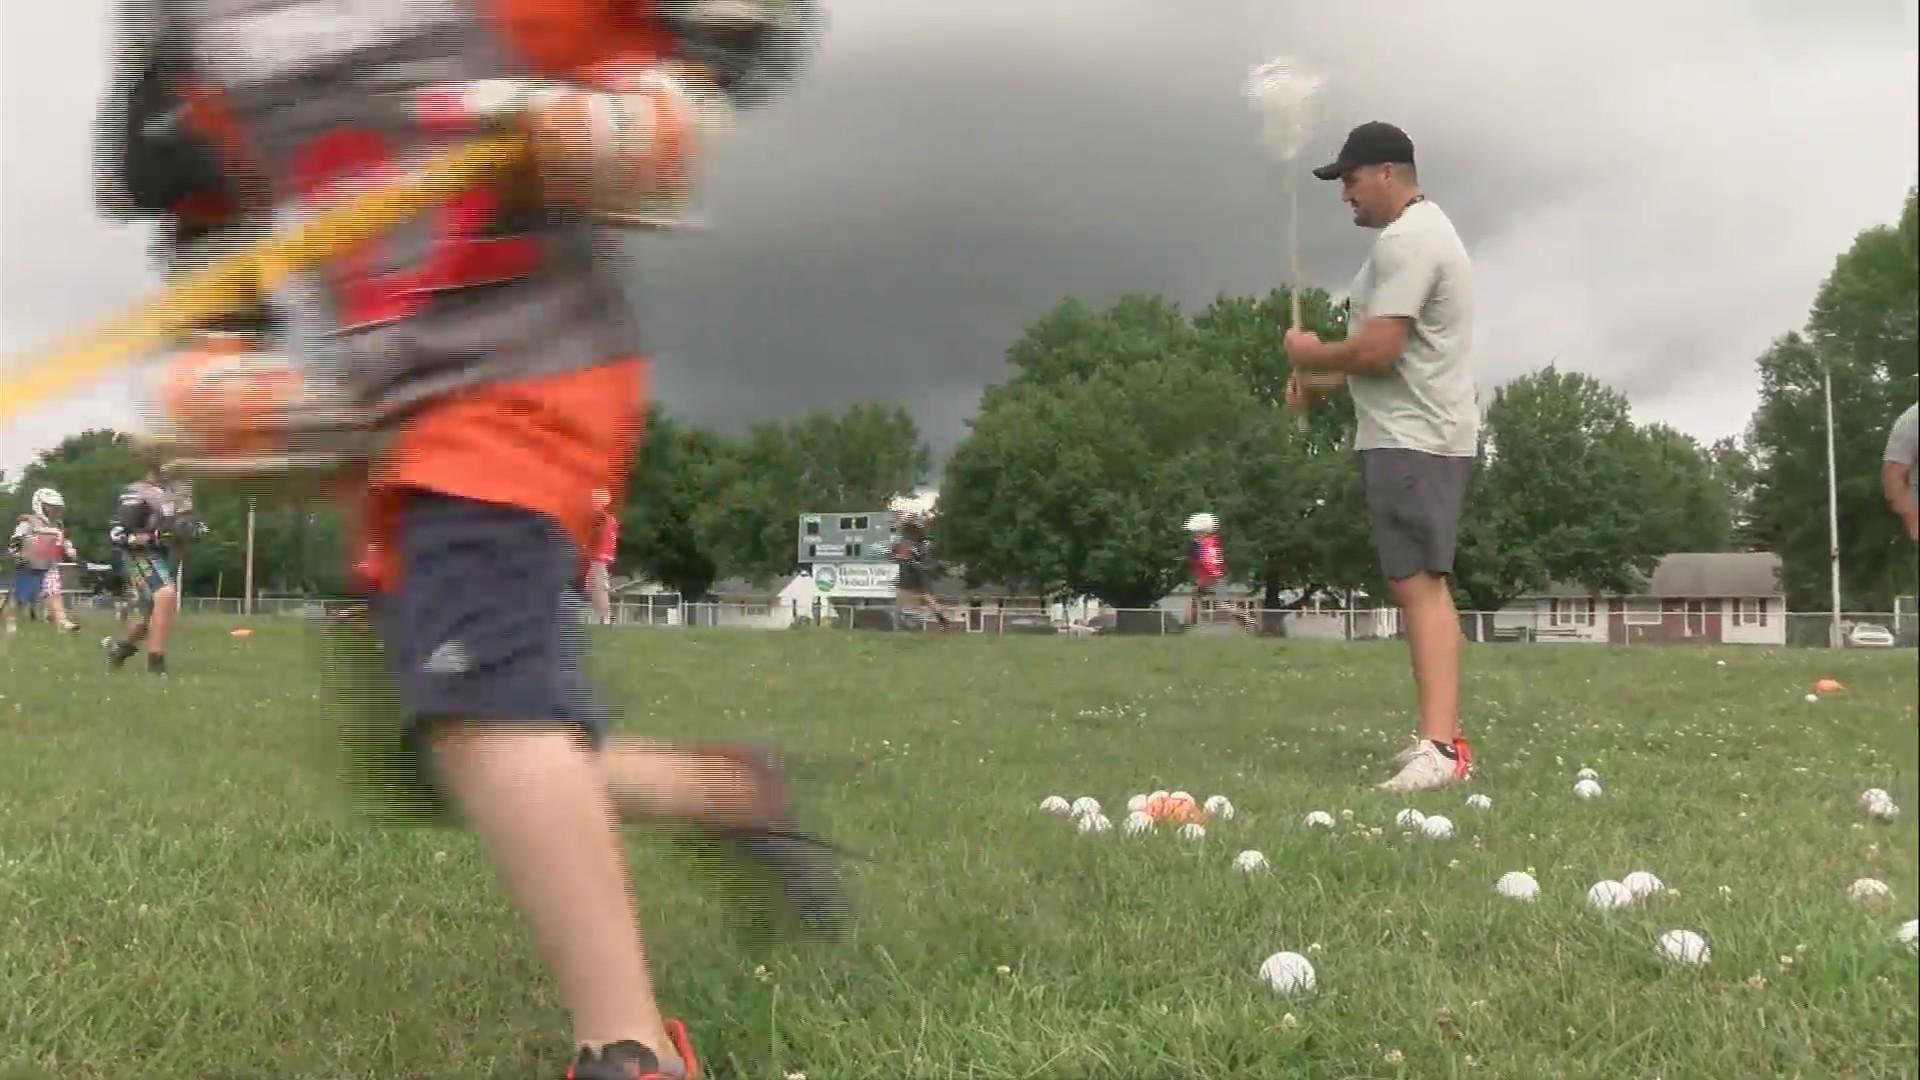 Ryan_Powell_Hosts_Local_Lacrosse_Camp_0_20190610230214